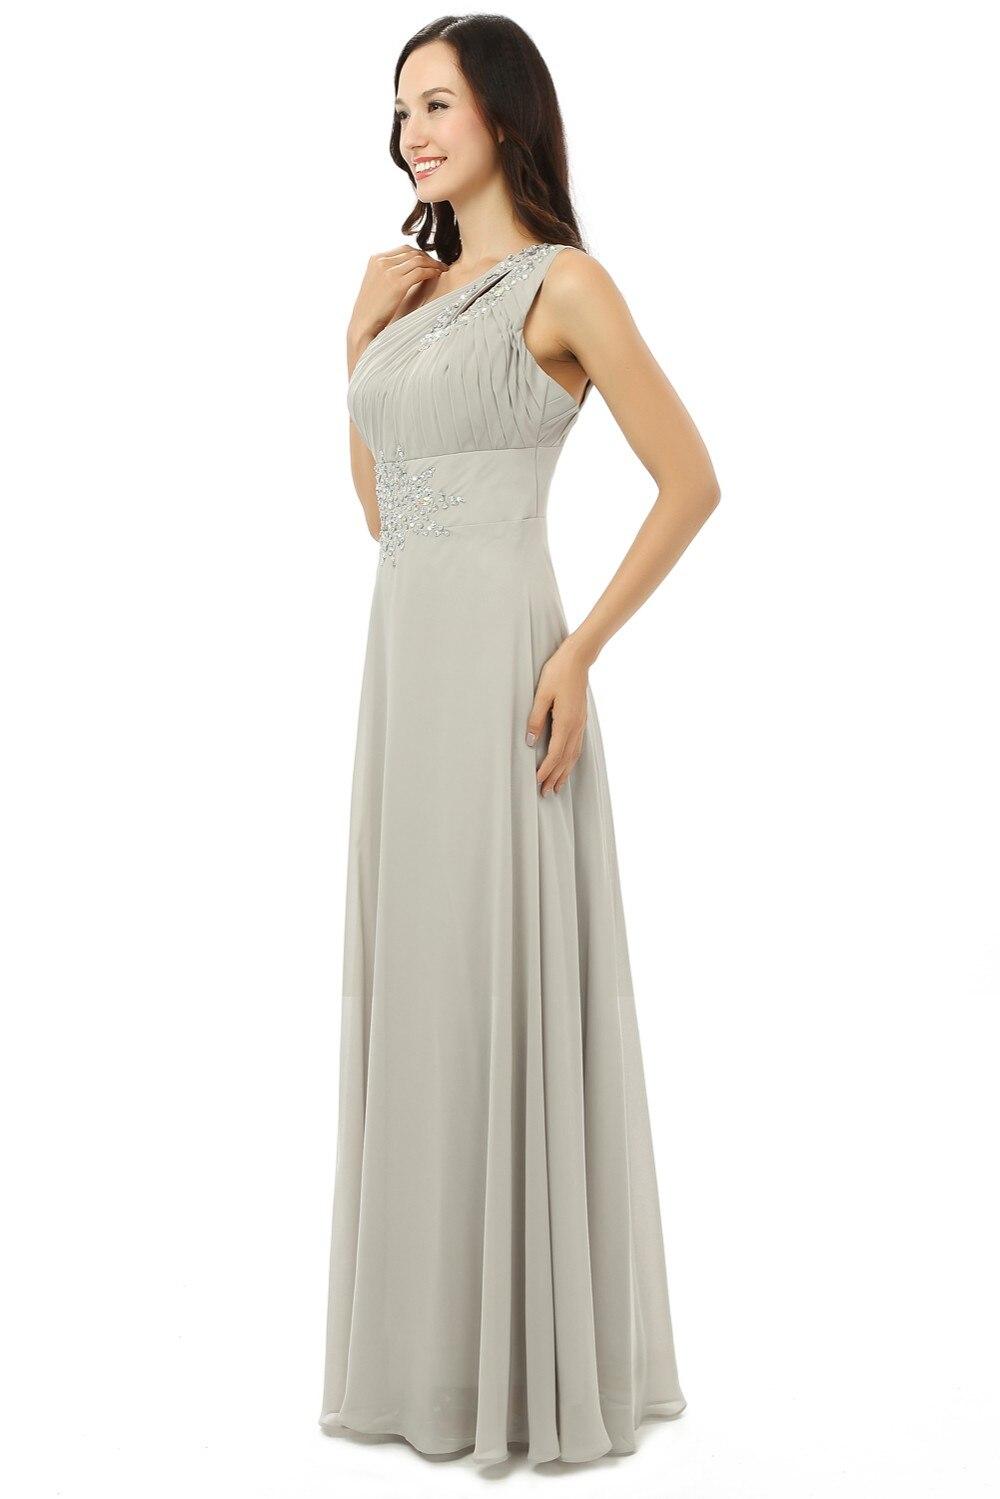 Cheap silver bridesmaid dresses under 50 fashion dresses cheap silver bridesmaid dresses under 50 ombrellifo Images